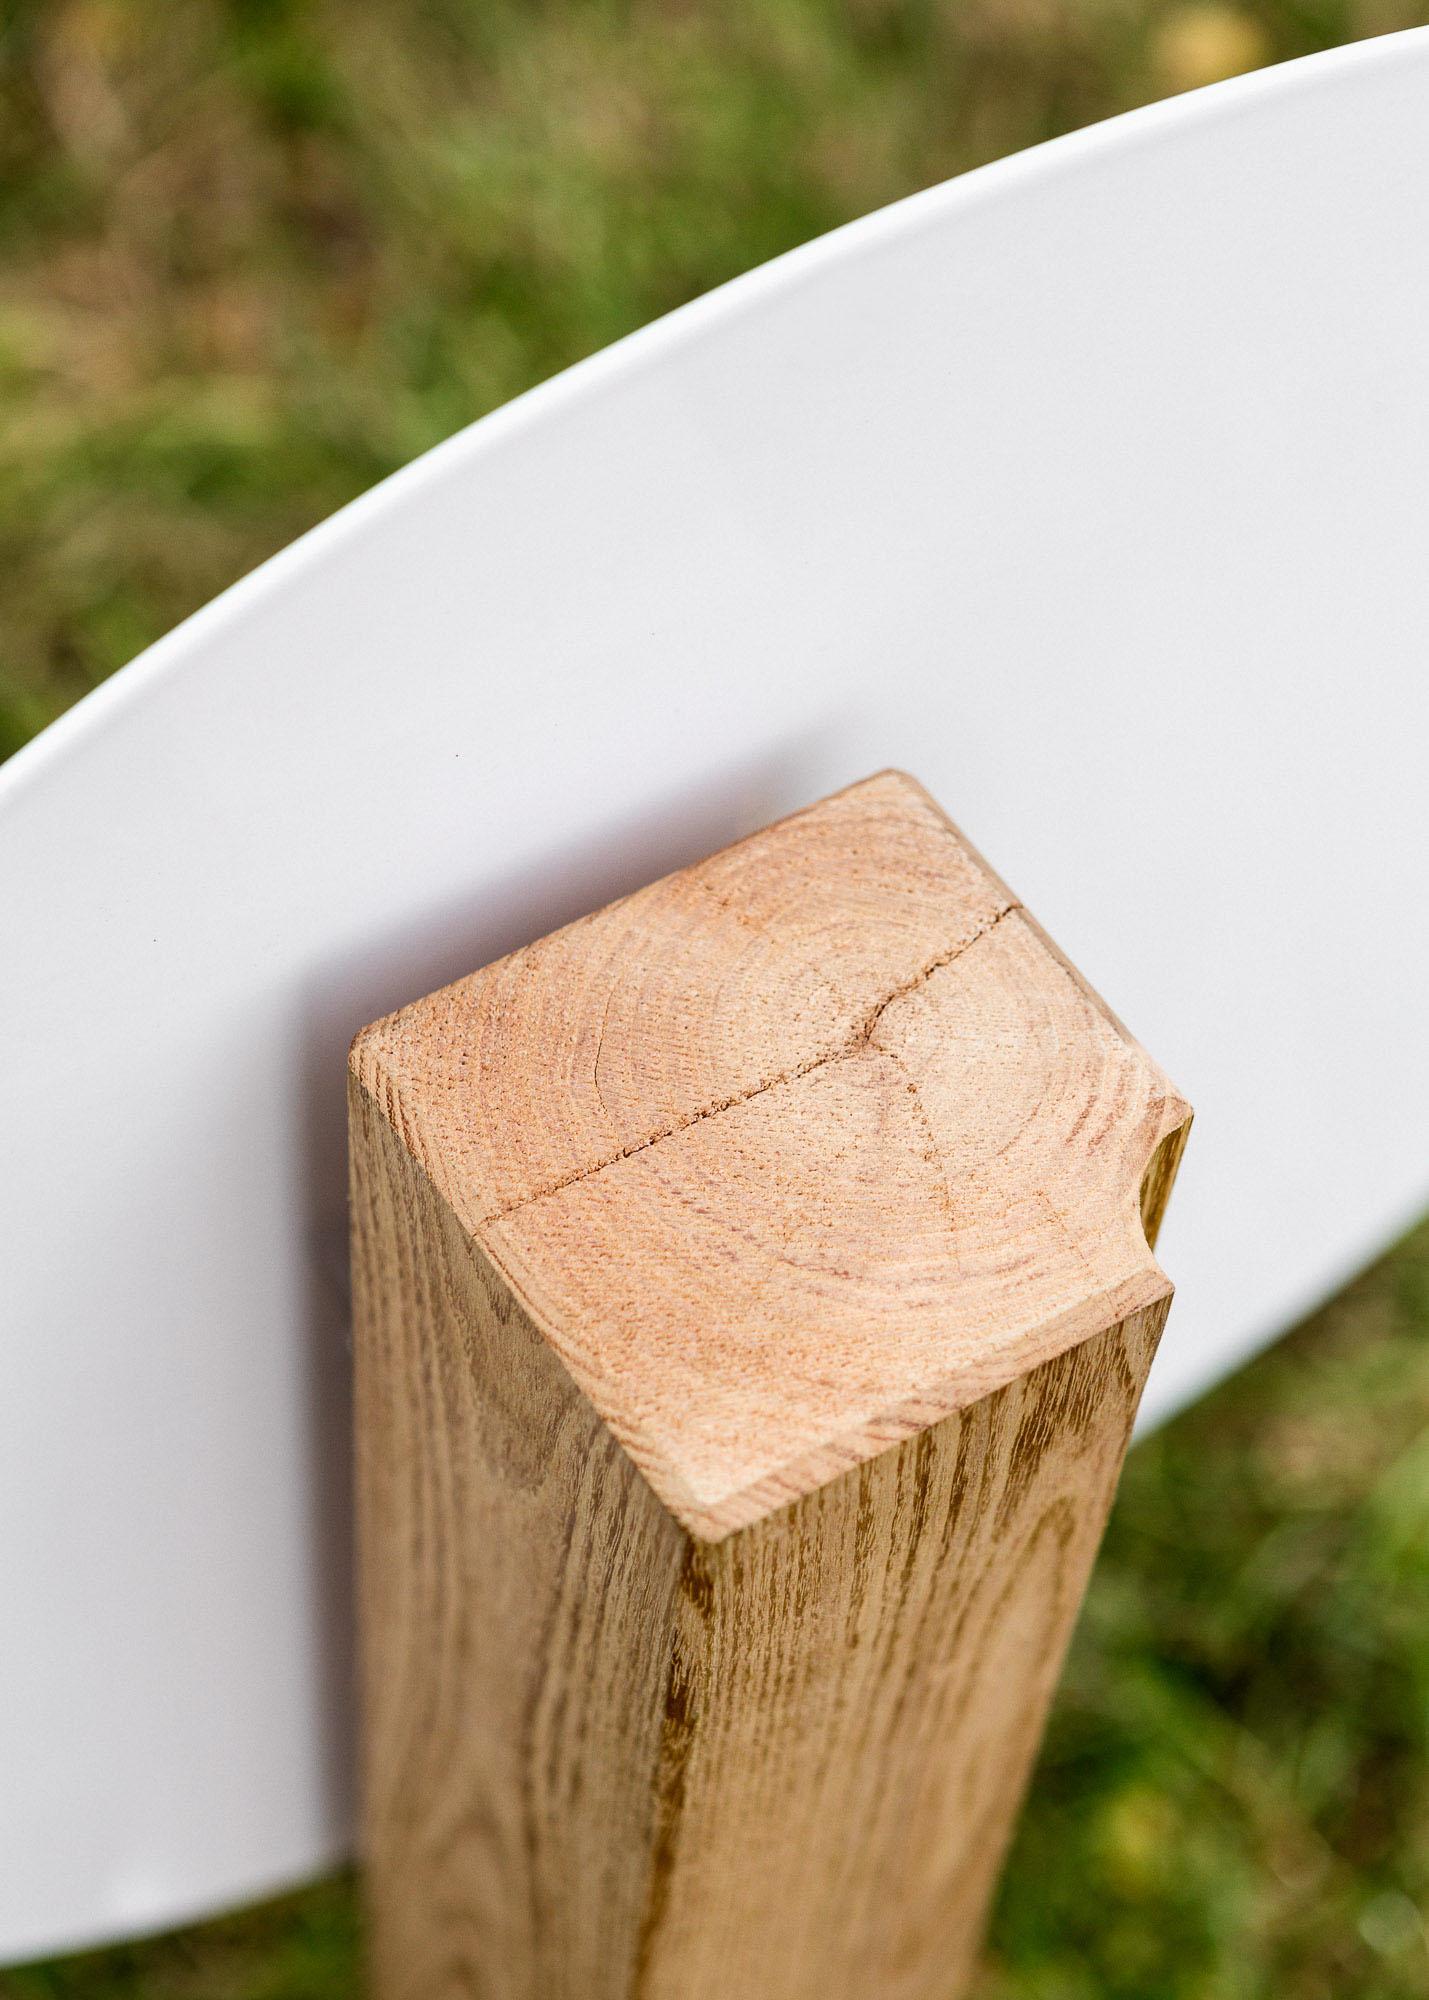 Holzgrabmal - profilierte moderne Stele mit runder Emaille als Einzelgrabmal oder Familiengrabmal